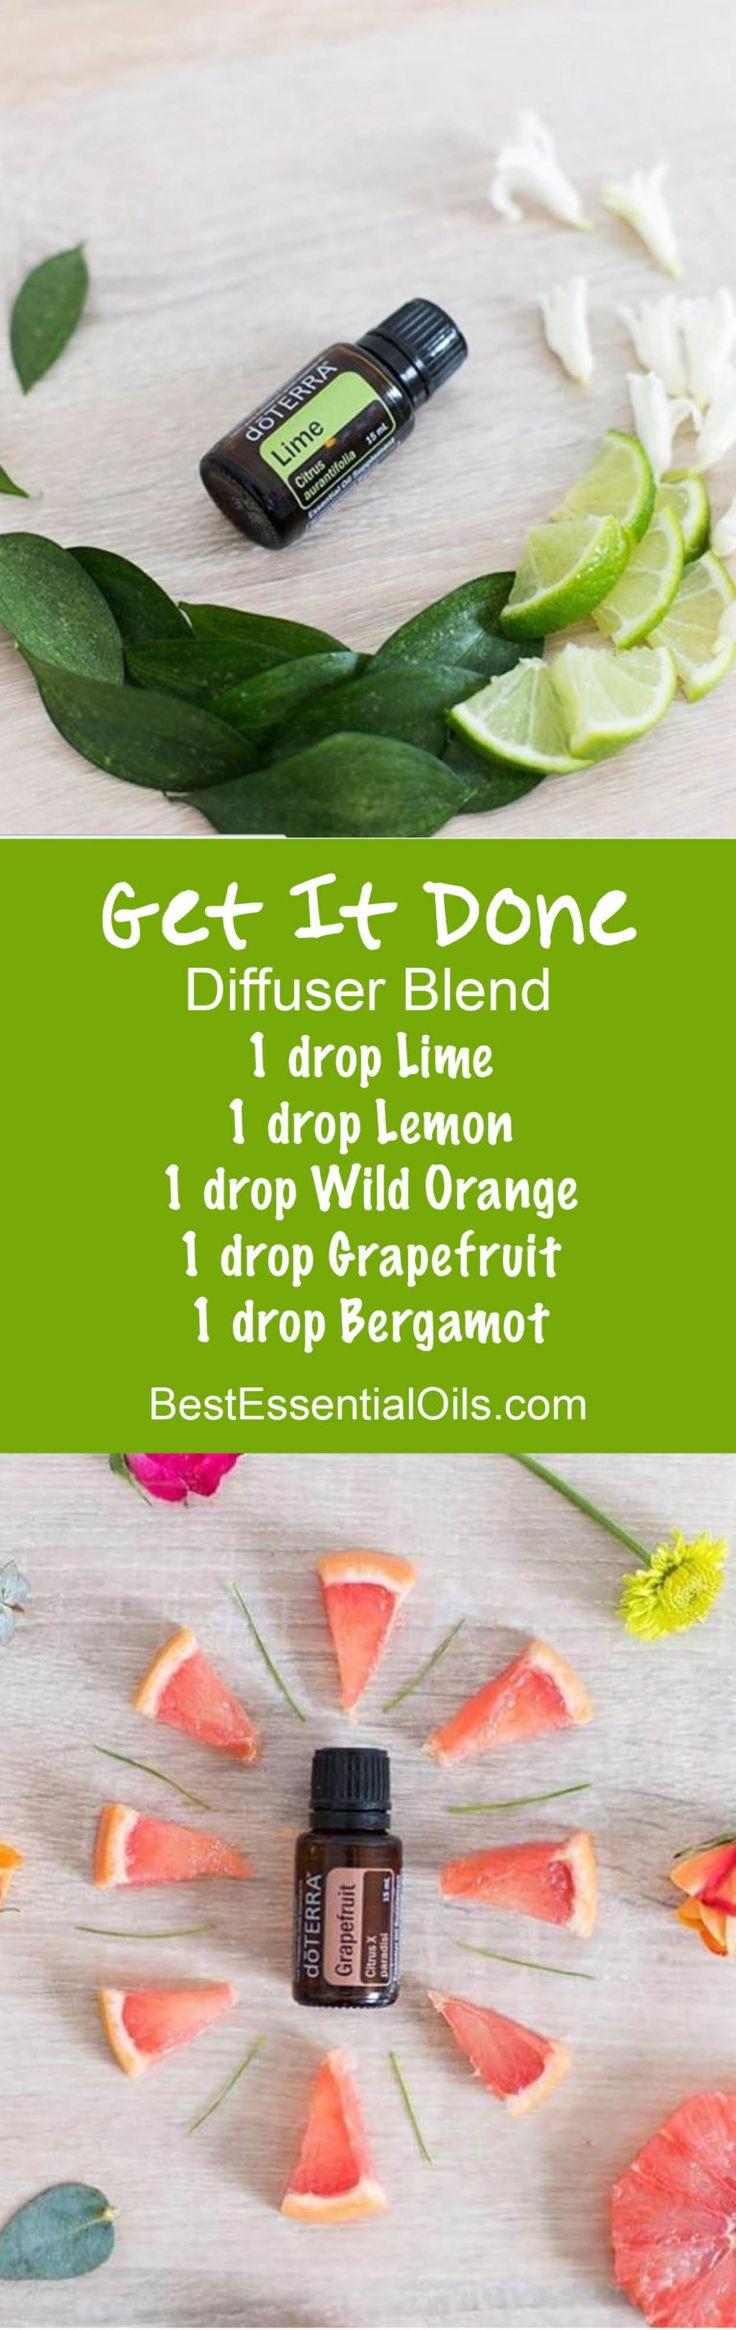 Get It Done doTERRA Diffuser Blend